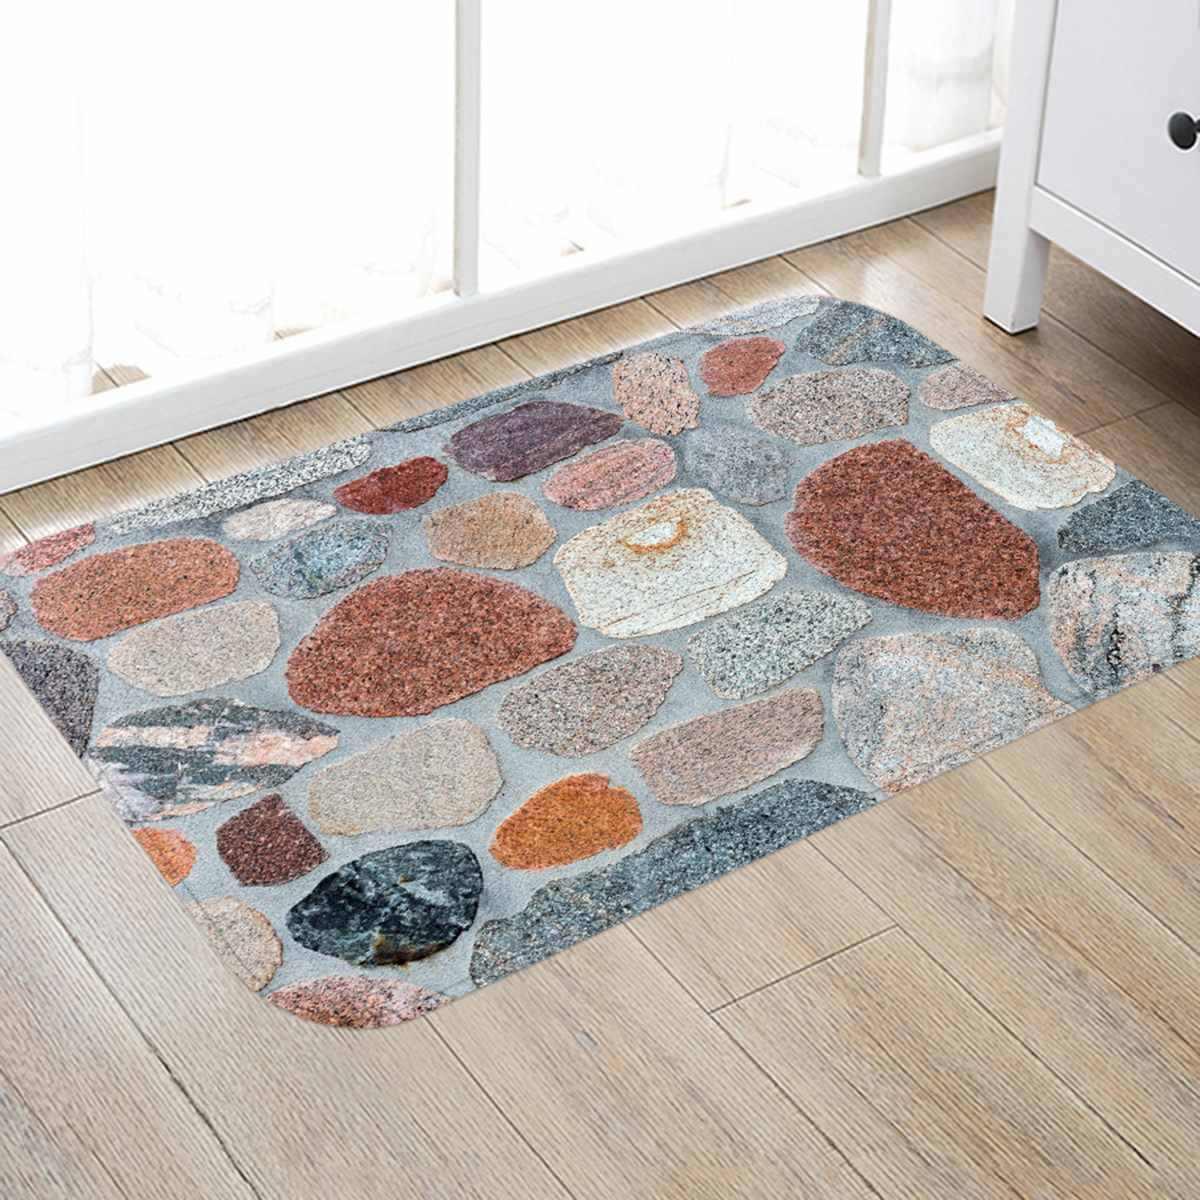 Non-slip Cobblestone หินรูปแบบประตู Mat Antislip ห้องโถงพรมเช็ดเท้าพรมครัวพรมสำหรับห้องนอน Corridor